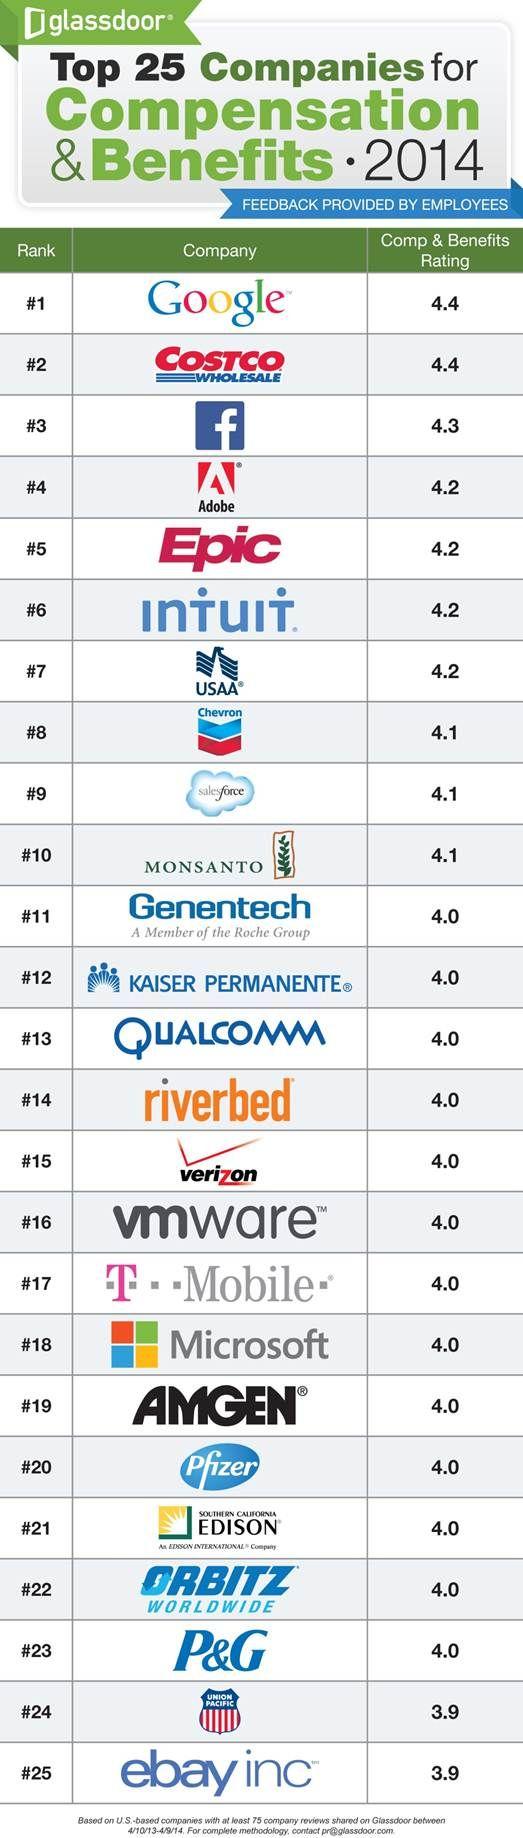 Glassdoor: Facebook ranks No. 3 behind Google, Costco in pay, benefits ratings - Inside Facebook